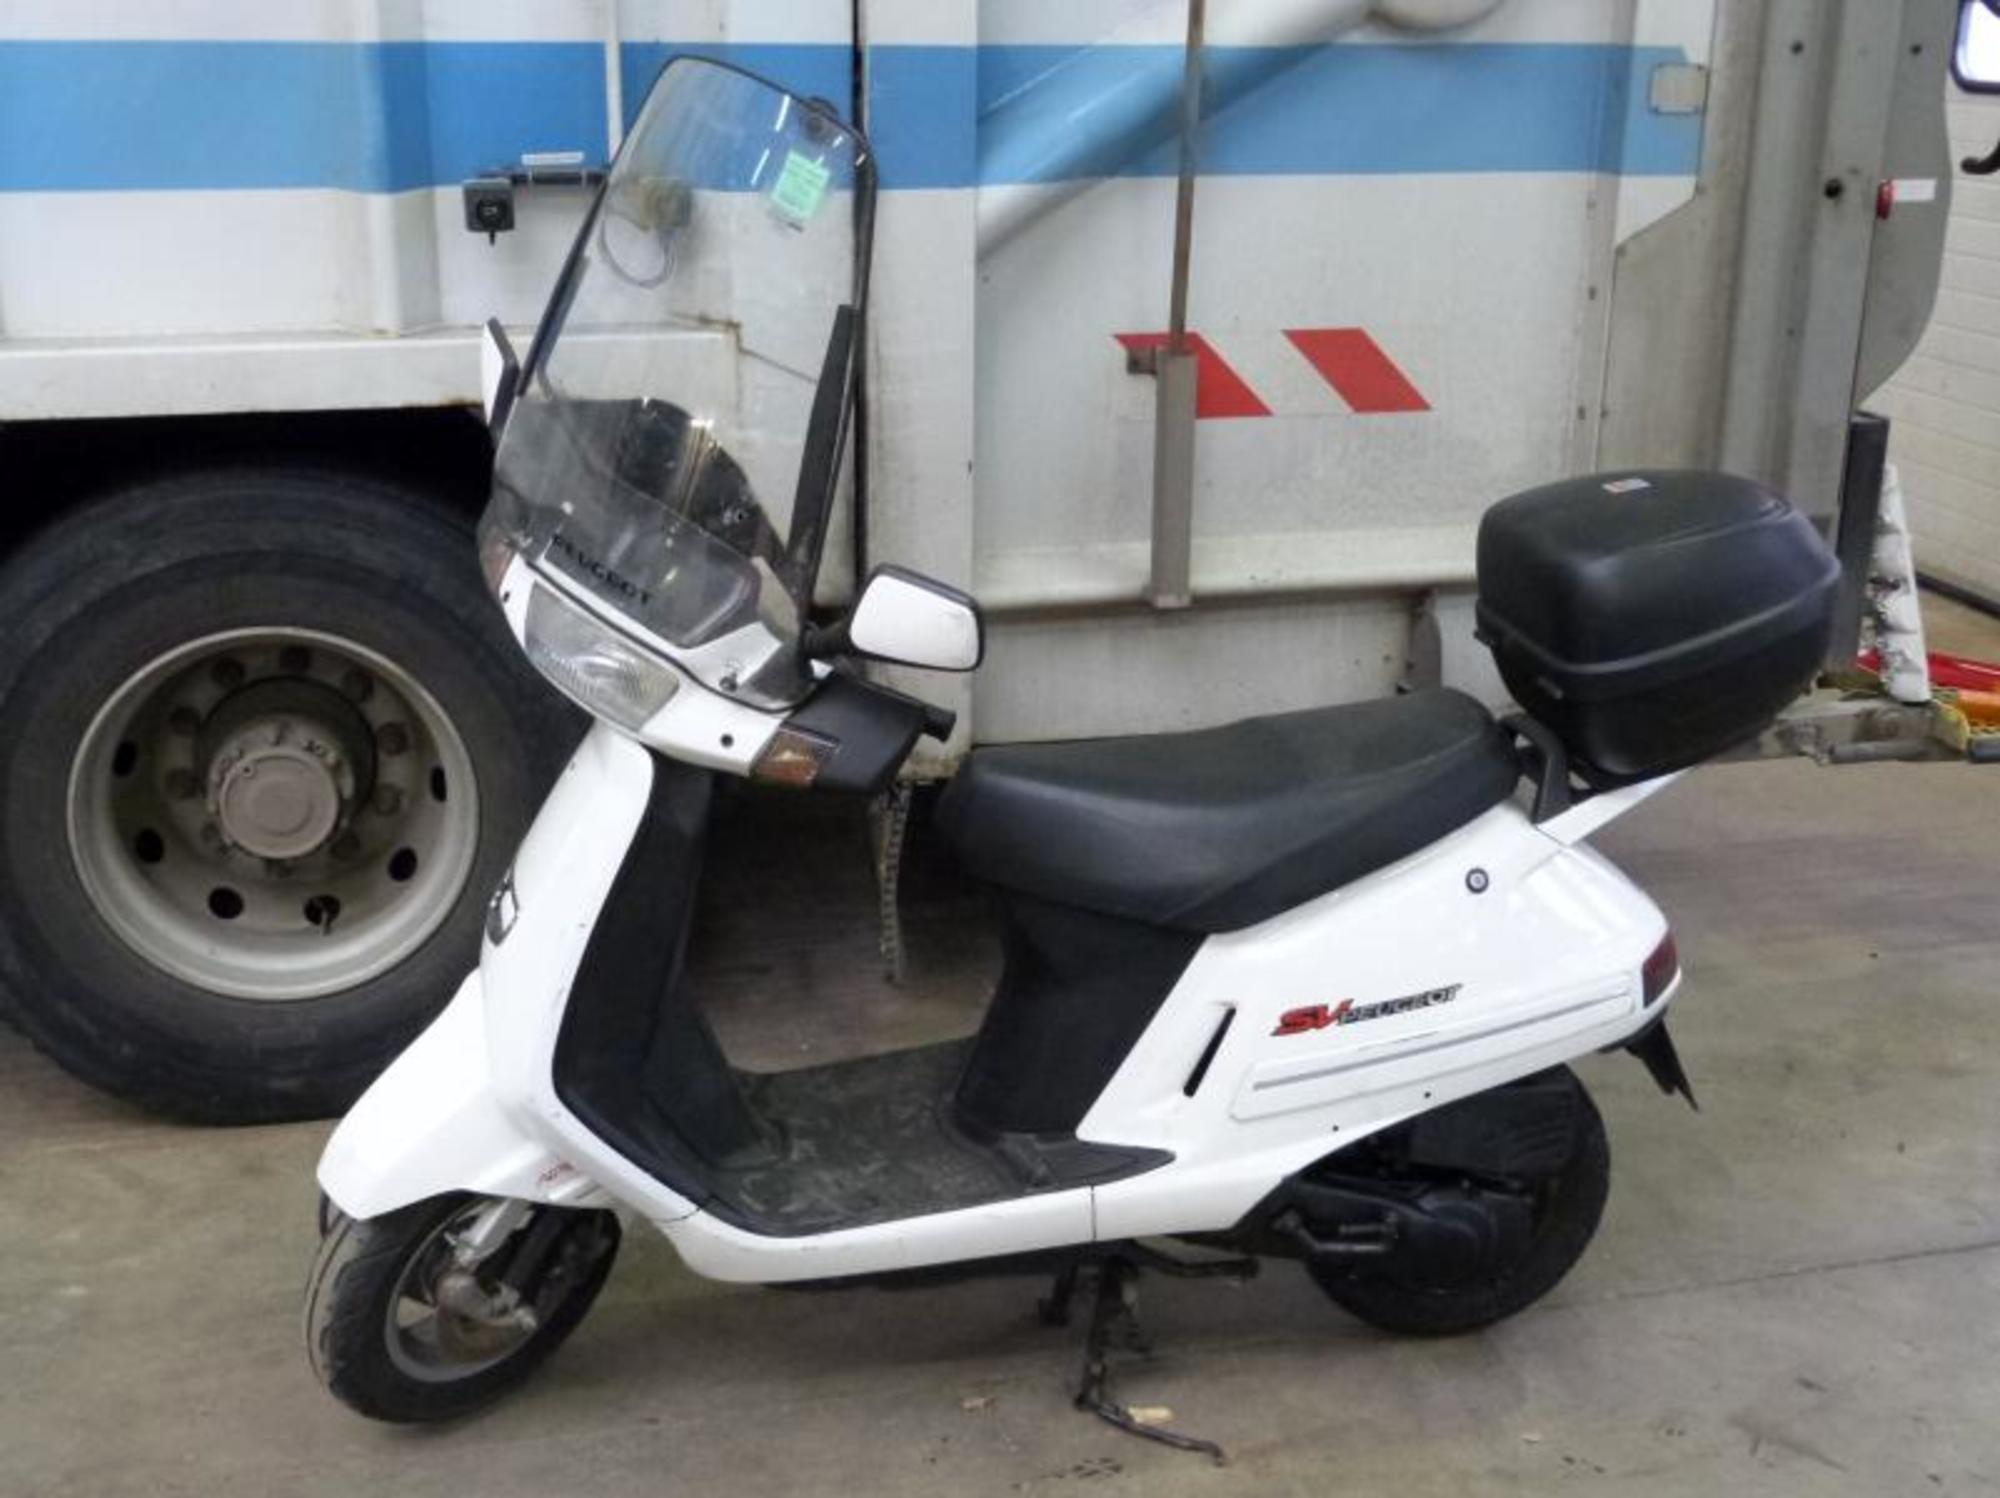 scooter peugeot sv 100cm3 moto scooter 2 roues d 39 occasion aux ench res agorastore. Black Bedroom Furniture Sets. Home Design Ideas